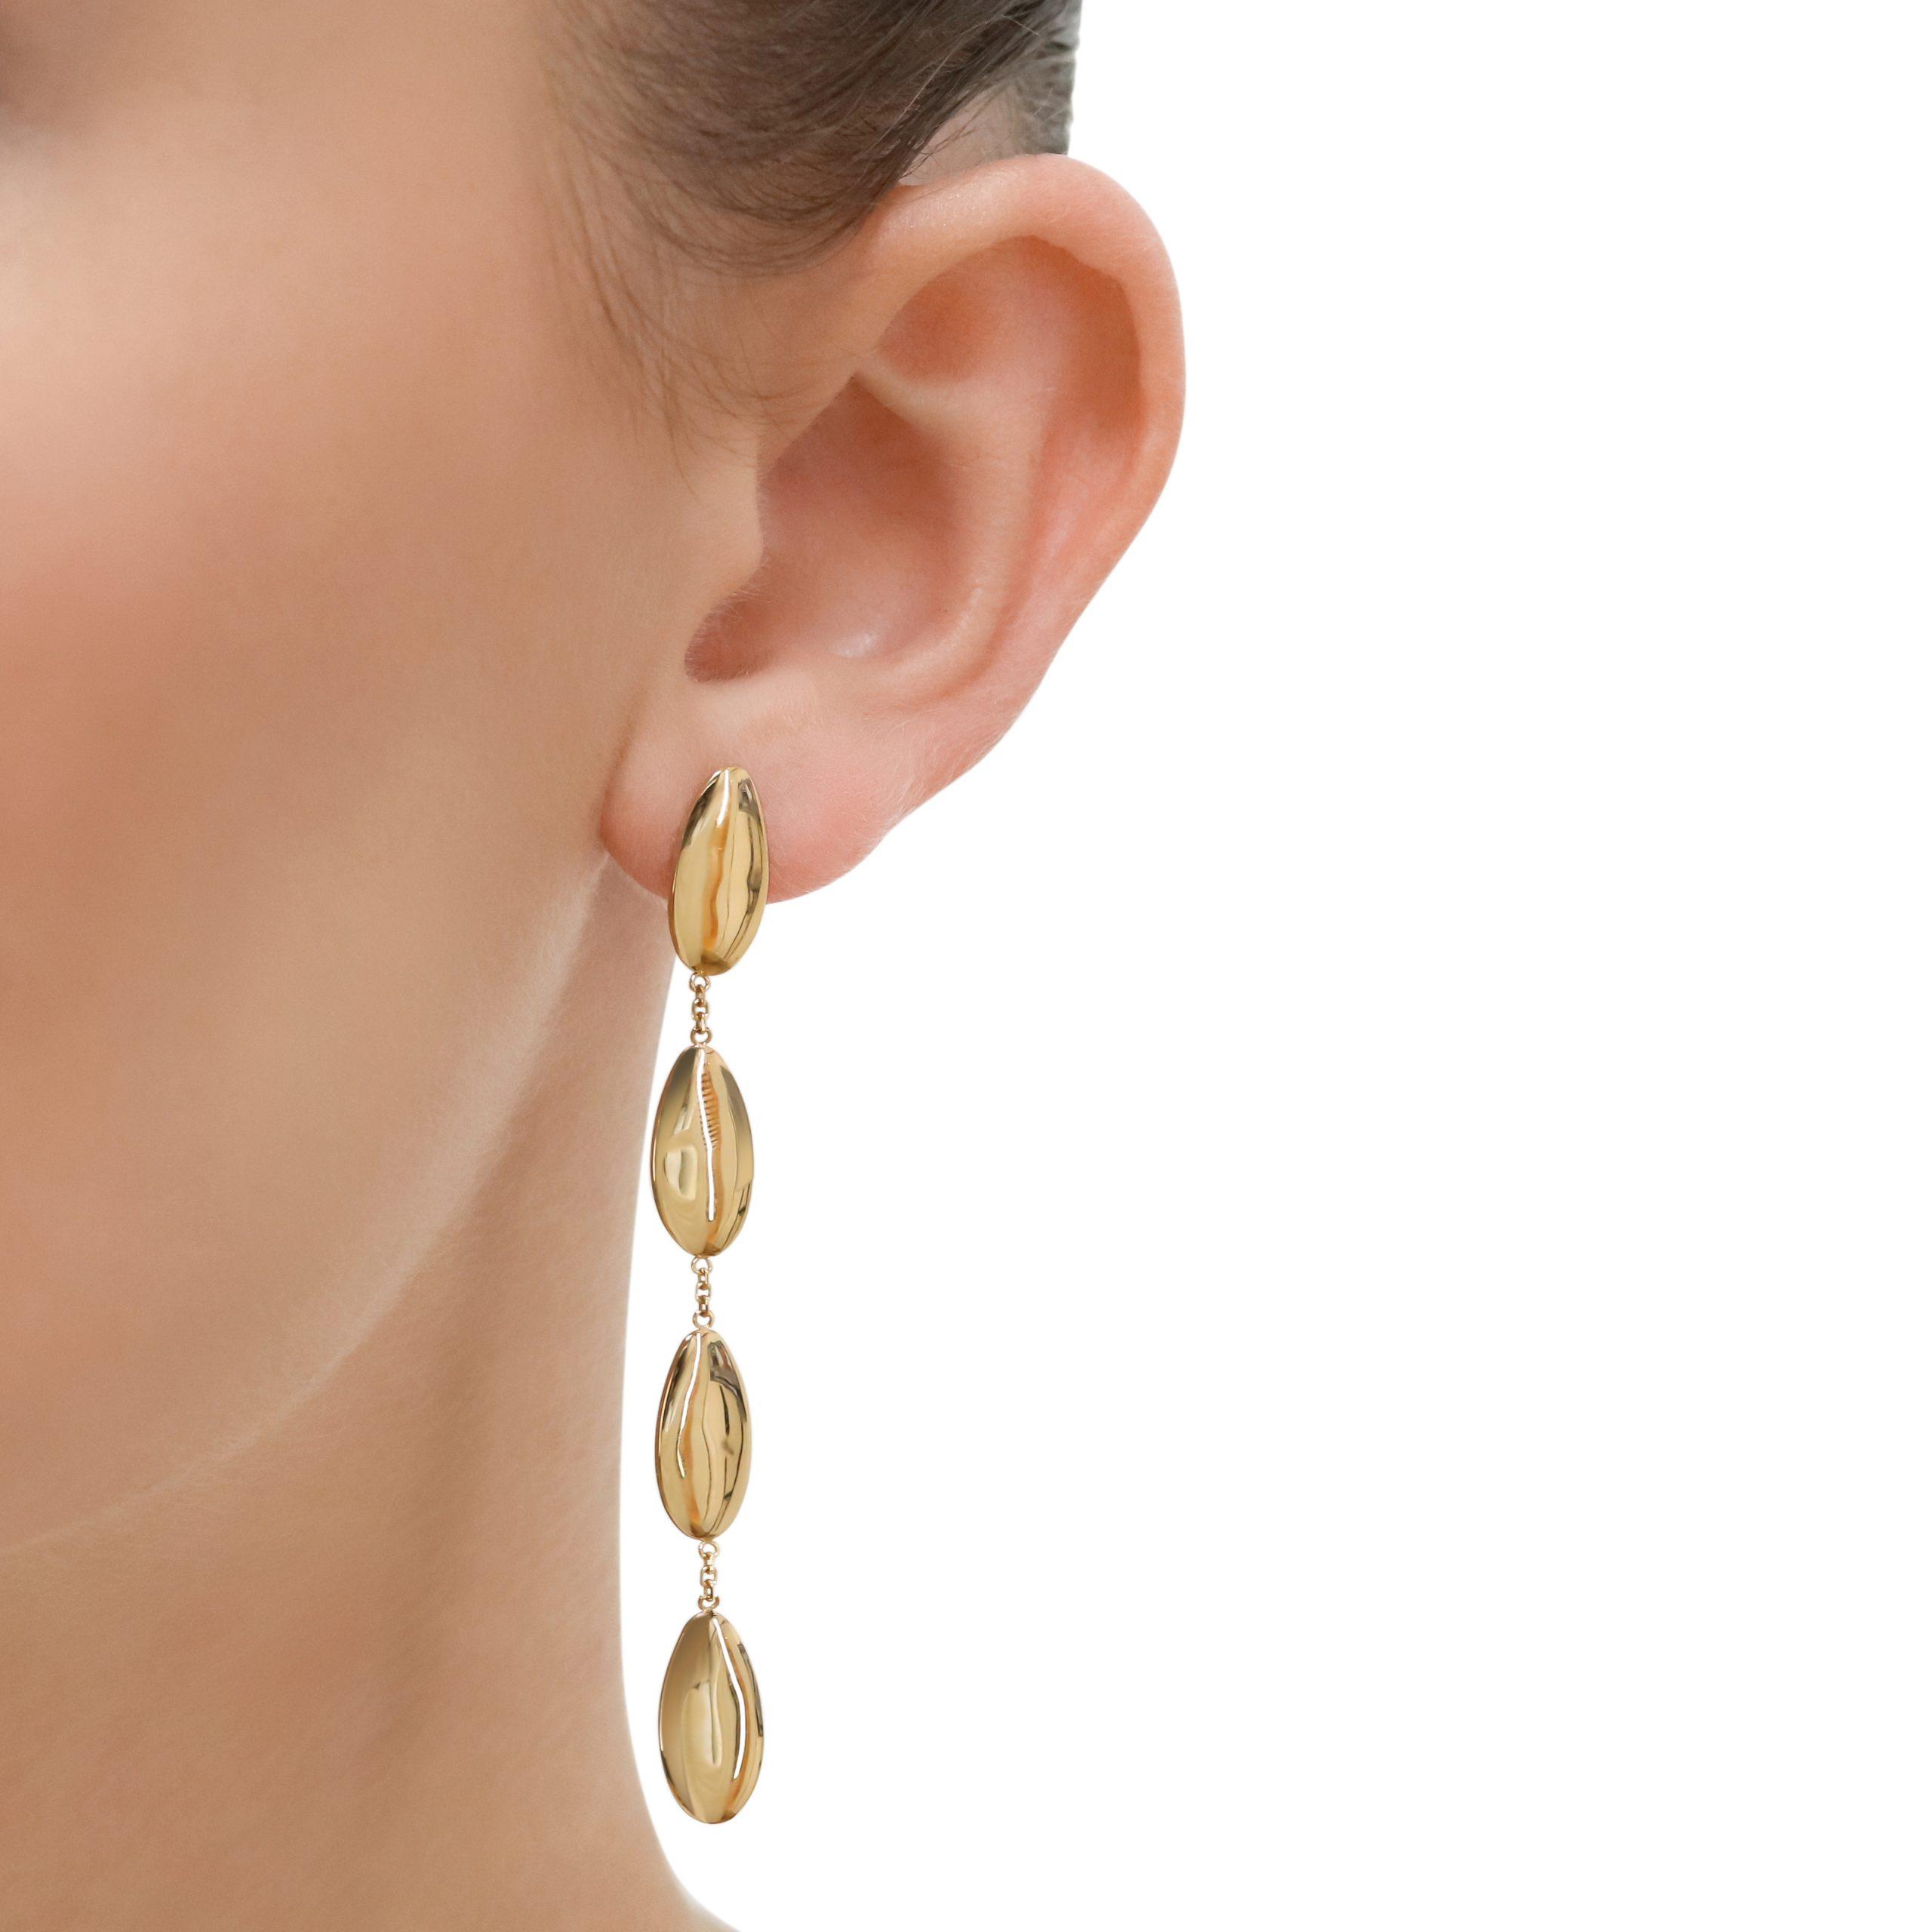 Giallo Yellow Gold Oval Drop Earrings